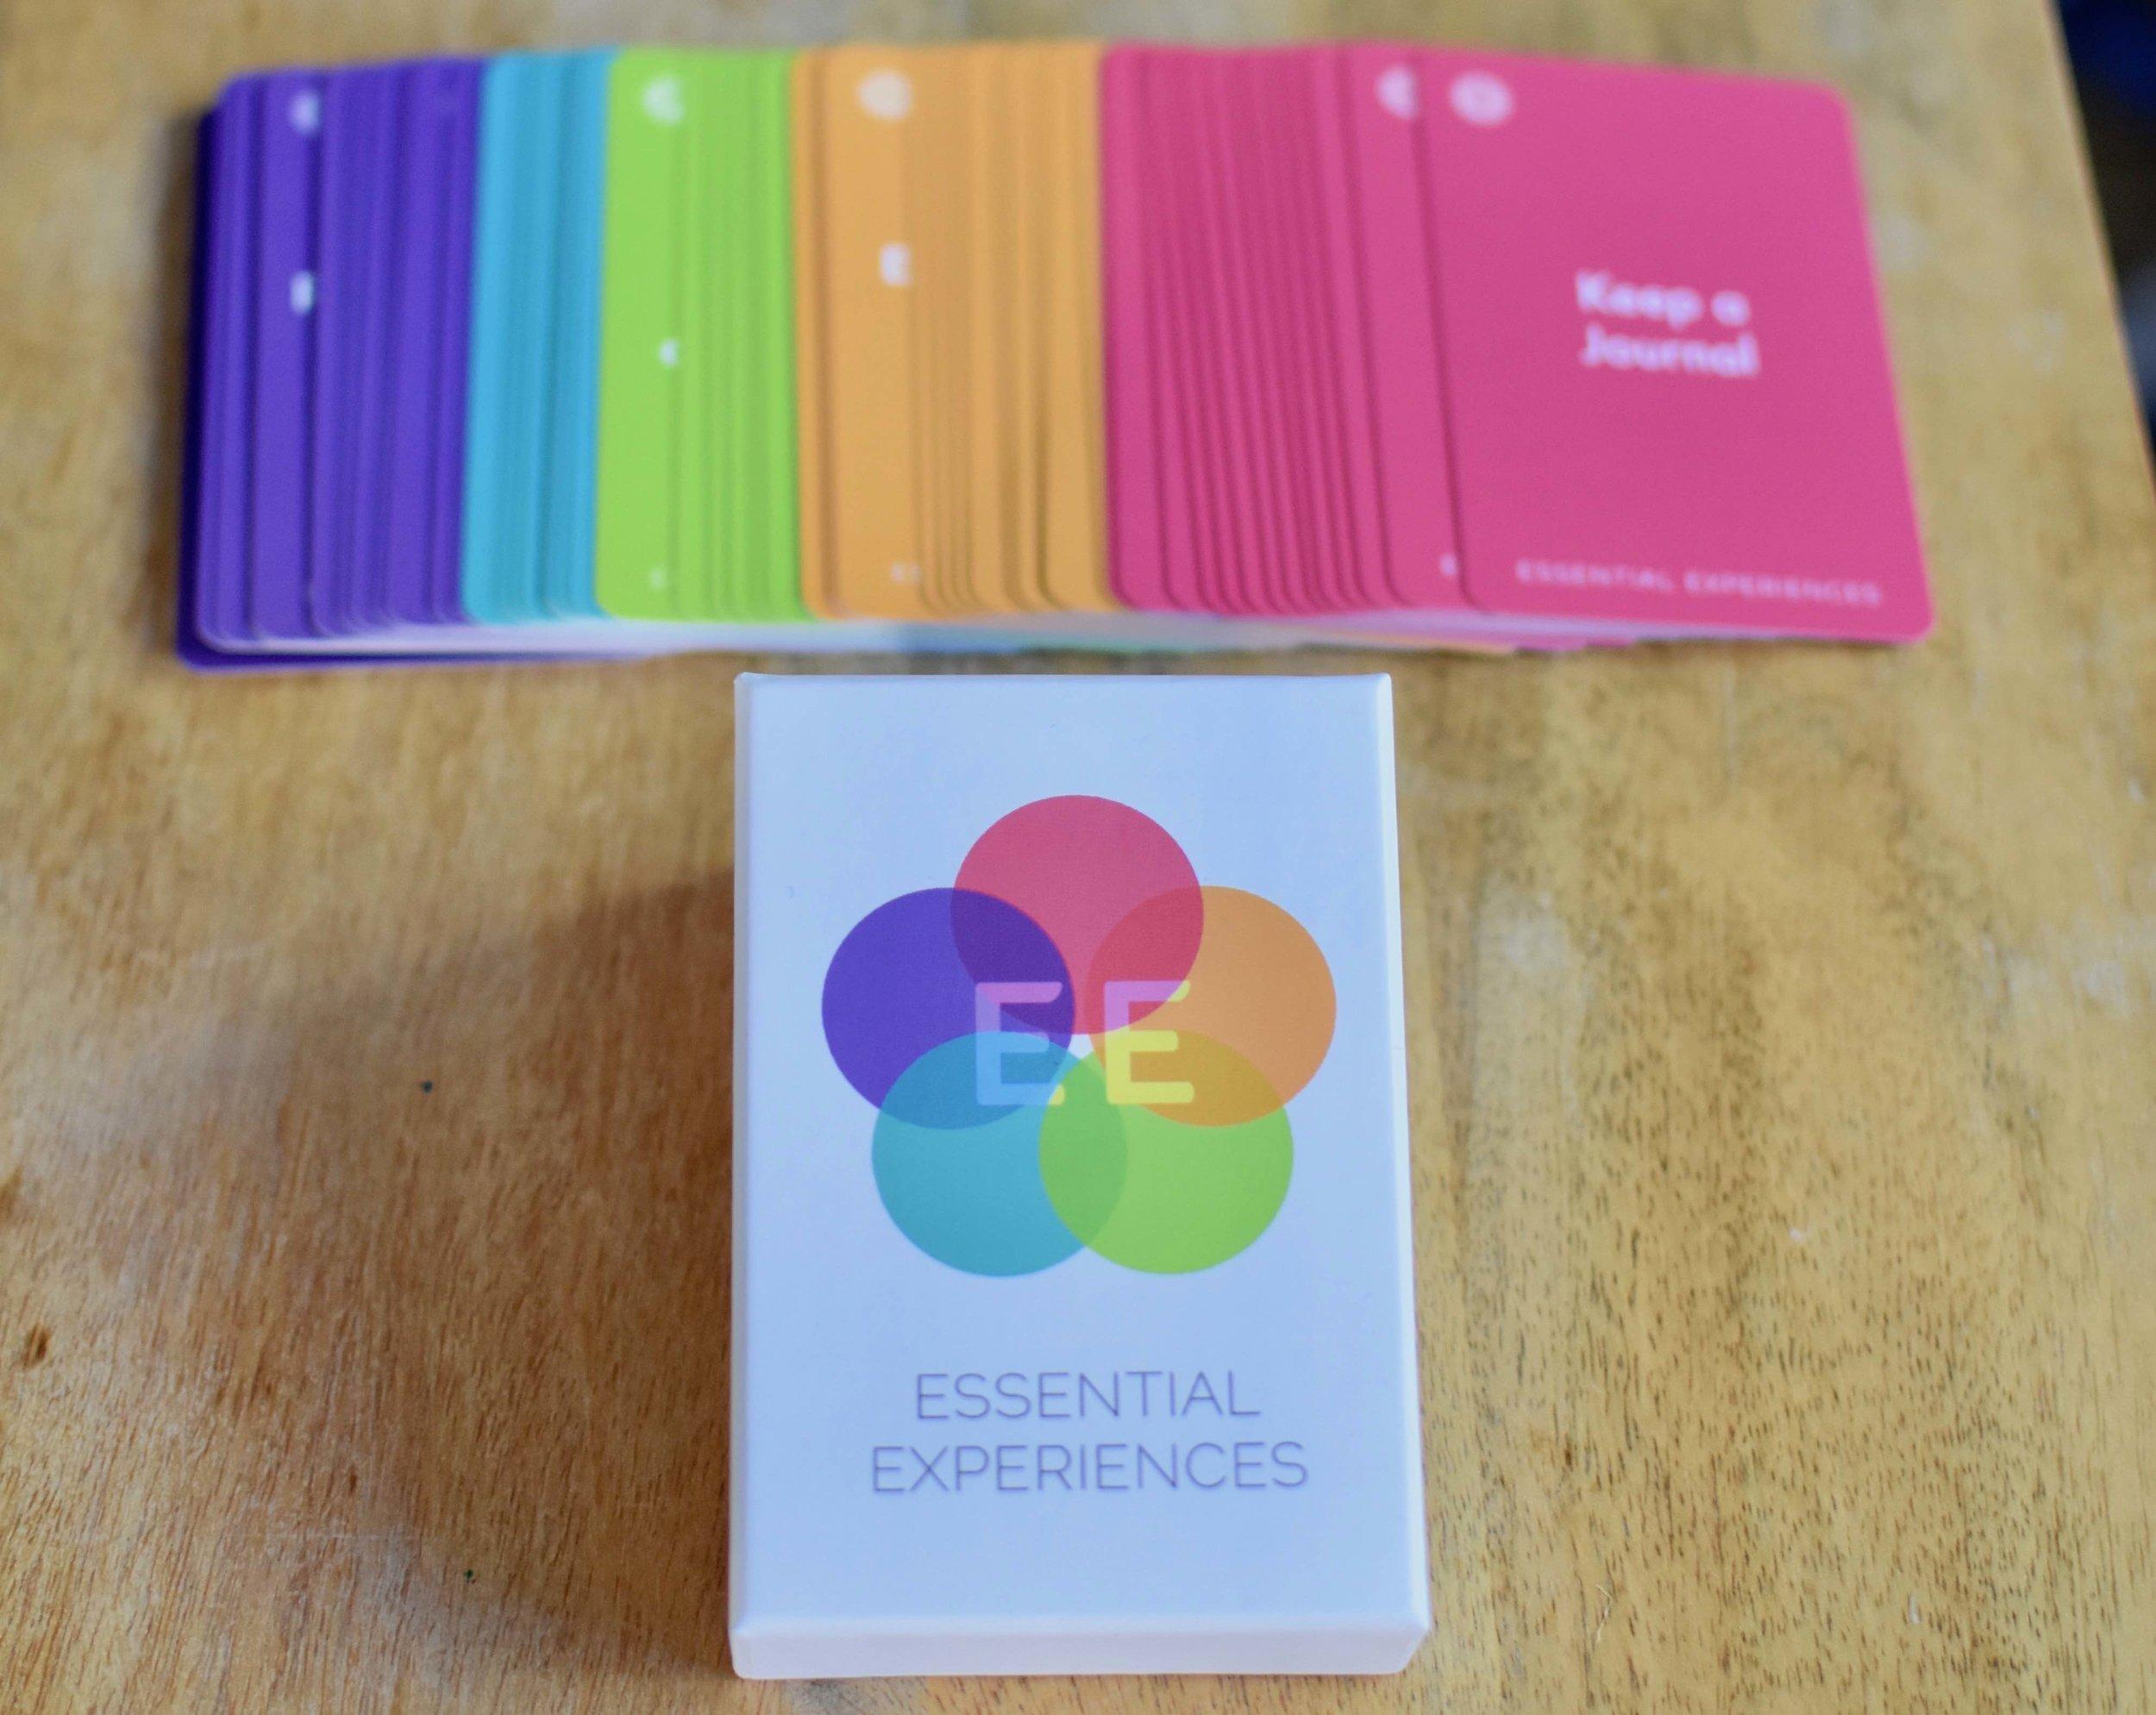 Essential Experiences cards2.jpg